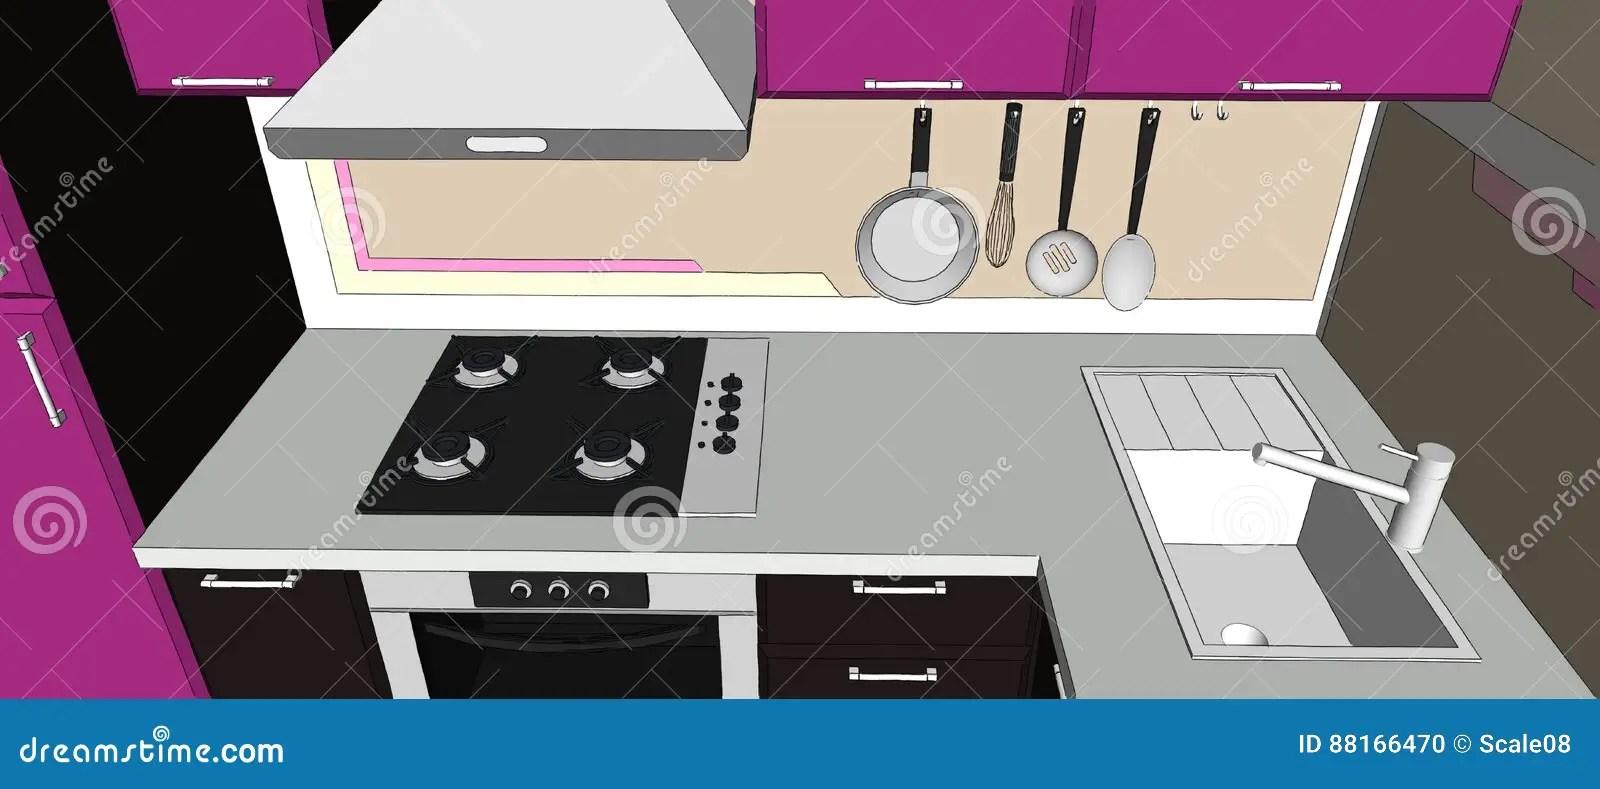 brown kitchen sink scratch dent appliances 3d紫色和棕色厨房角落的例证与装置的库存例证 插画包括有粉红色 厨具 3d紫色和棕色厨房角落的例证与发烟敞篷 厨师上面 水槽和装置的顶视图